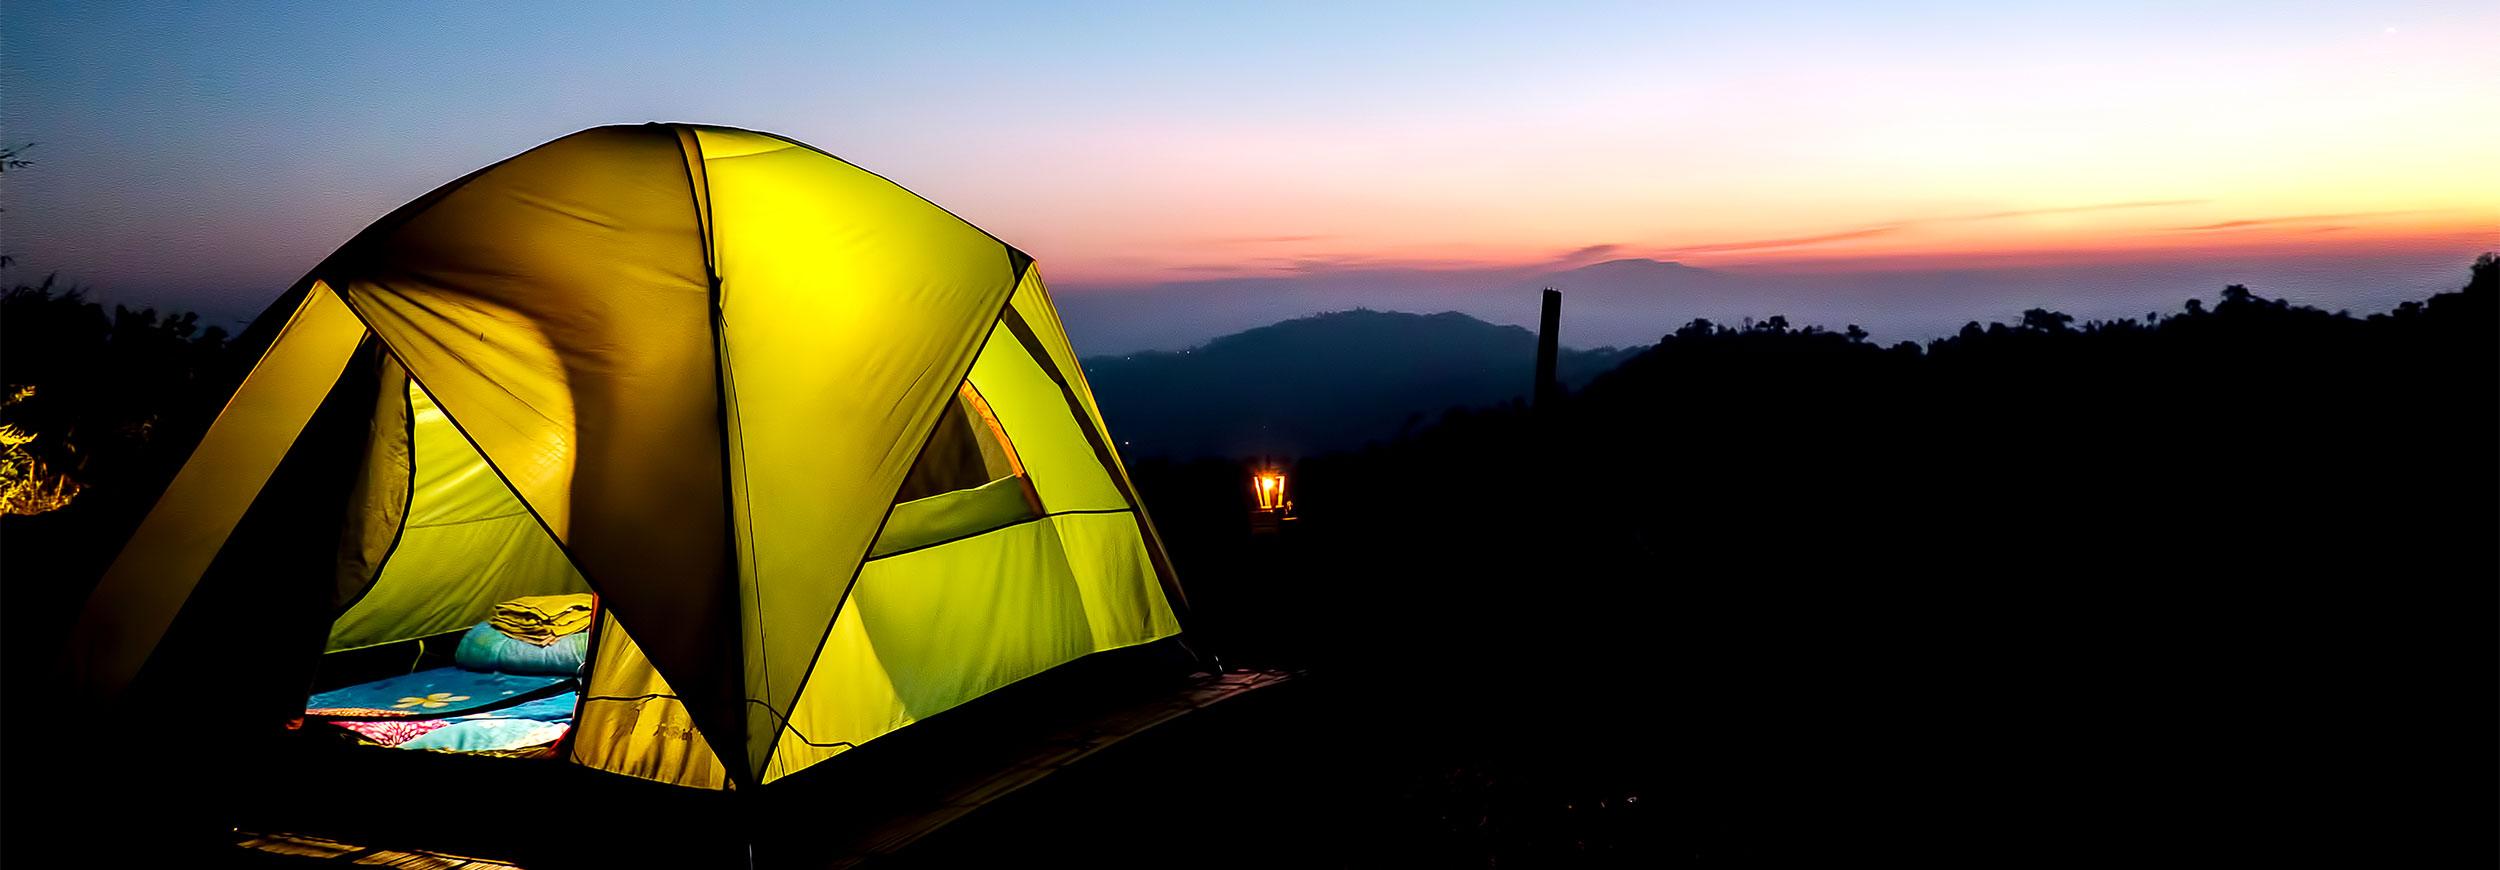 Camping - Green Battery - Energia disponibile ovunque - Ebox - Jesi